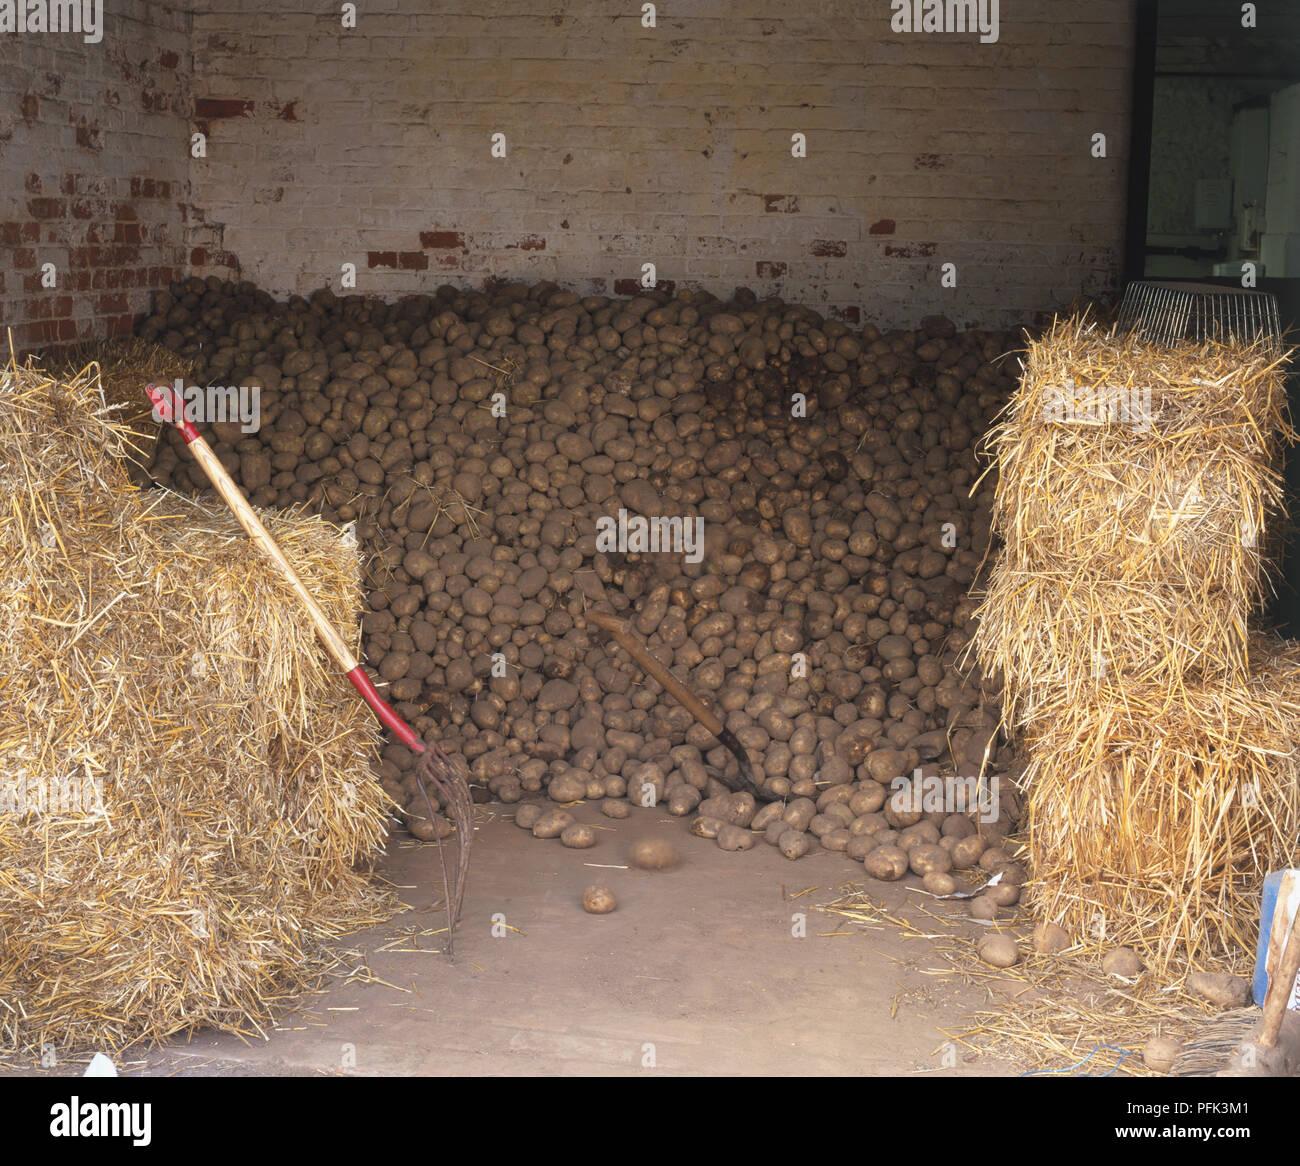 Pile of potatoes. - Stock Image